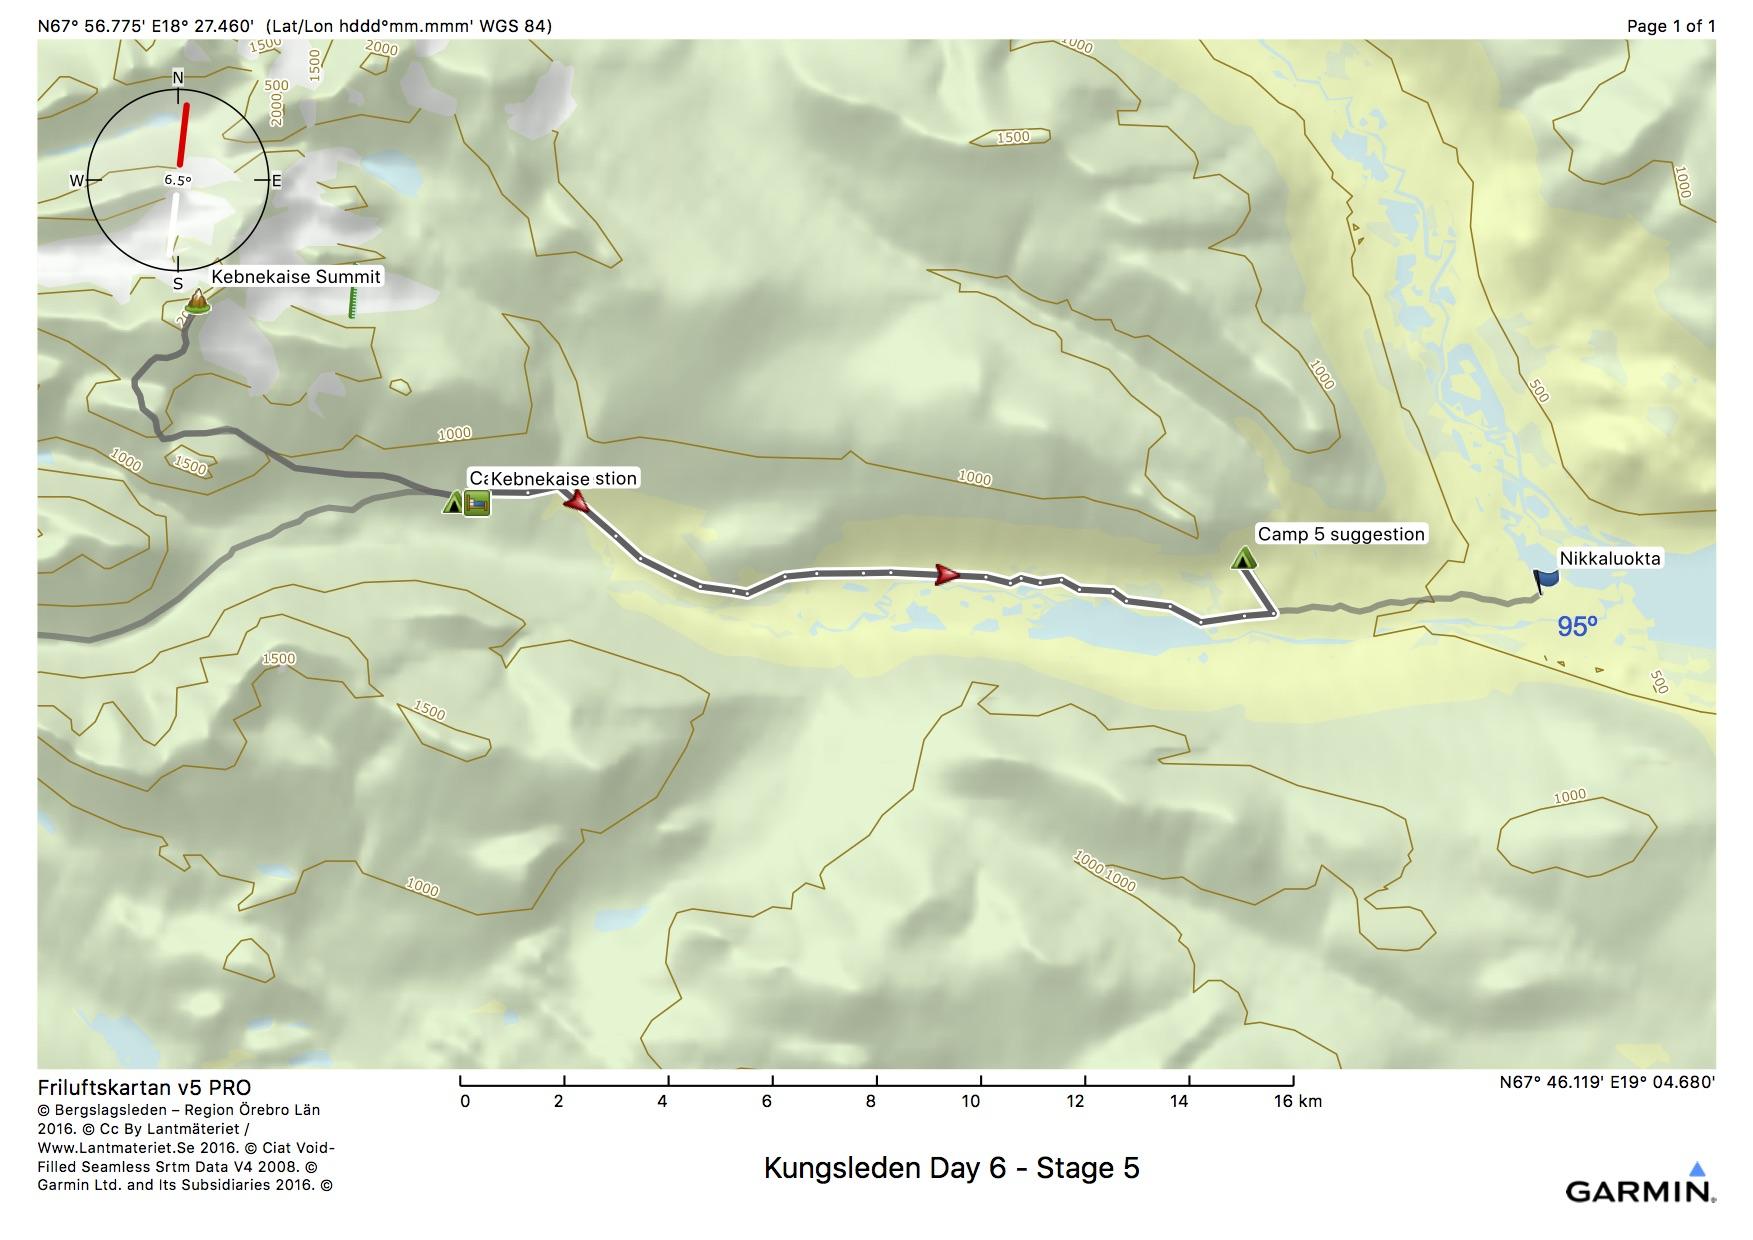 Kungsleden Day 6 - Stage 5